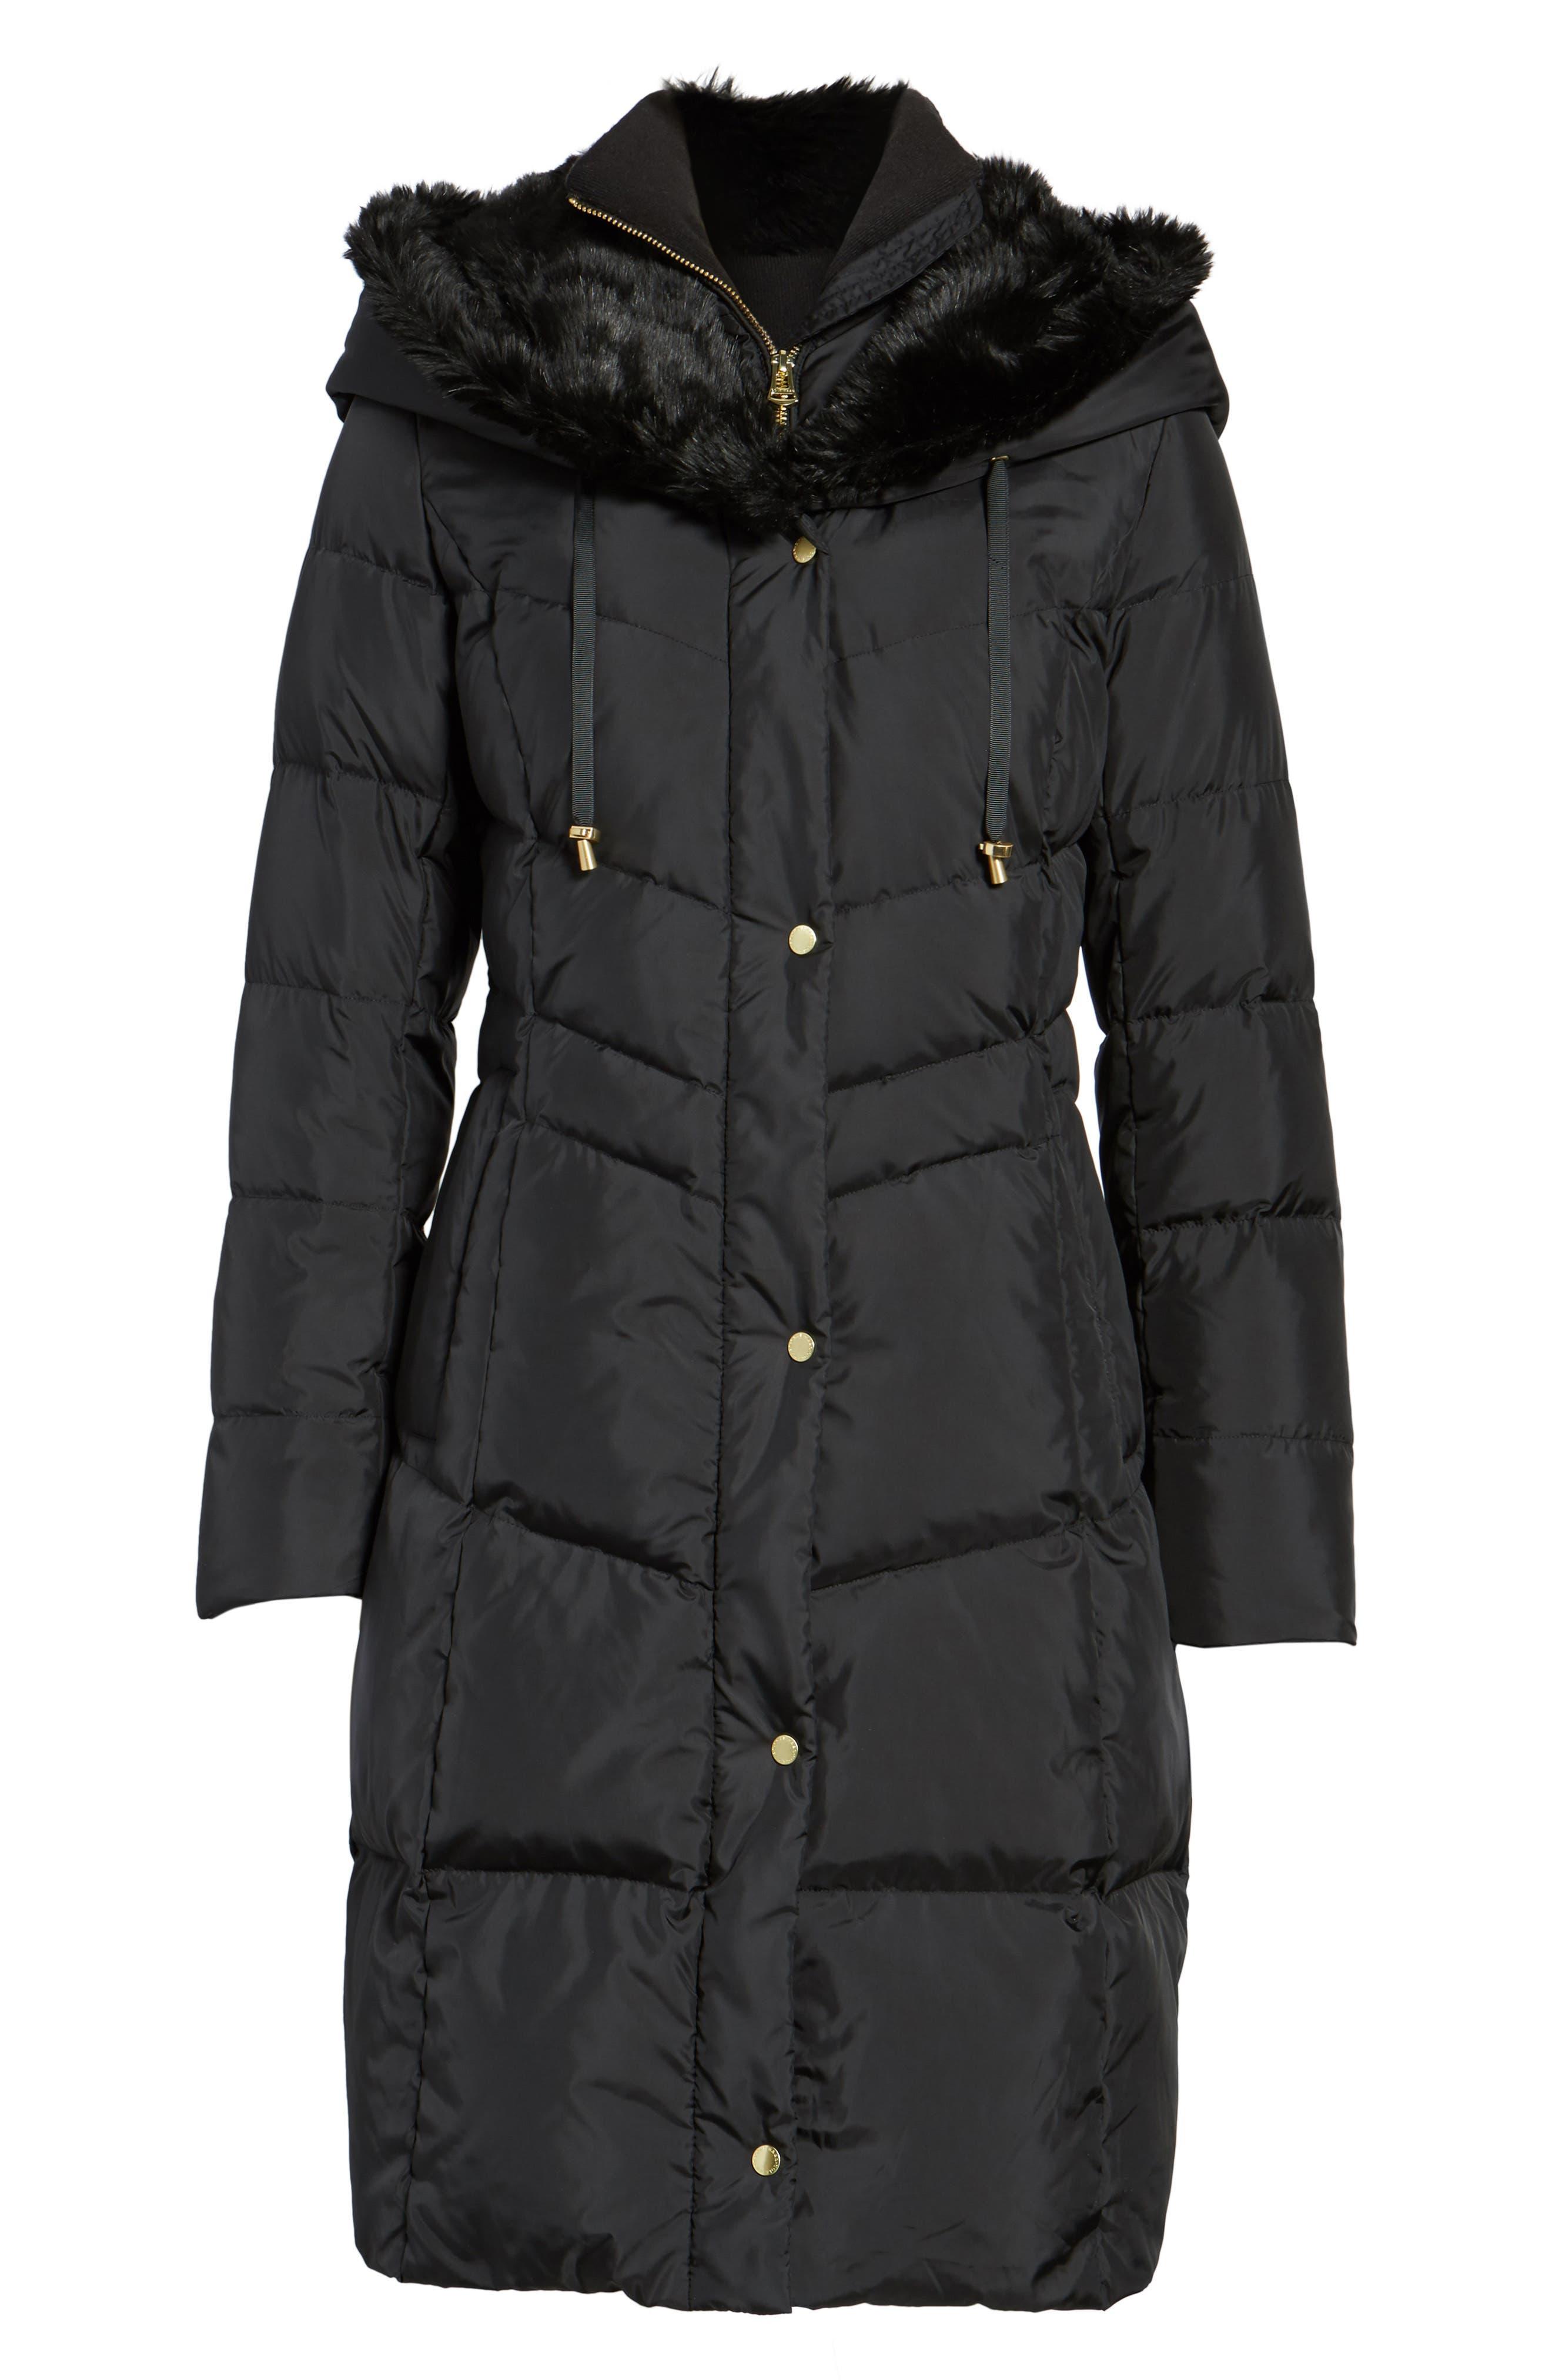 3/4 Down Coat with Faux Fur Hood,                             Alternate thumbnail 5, color,                             001